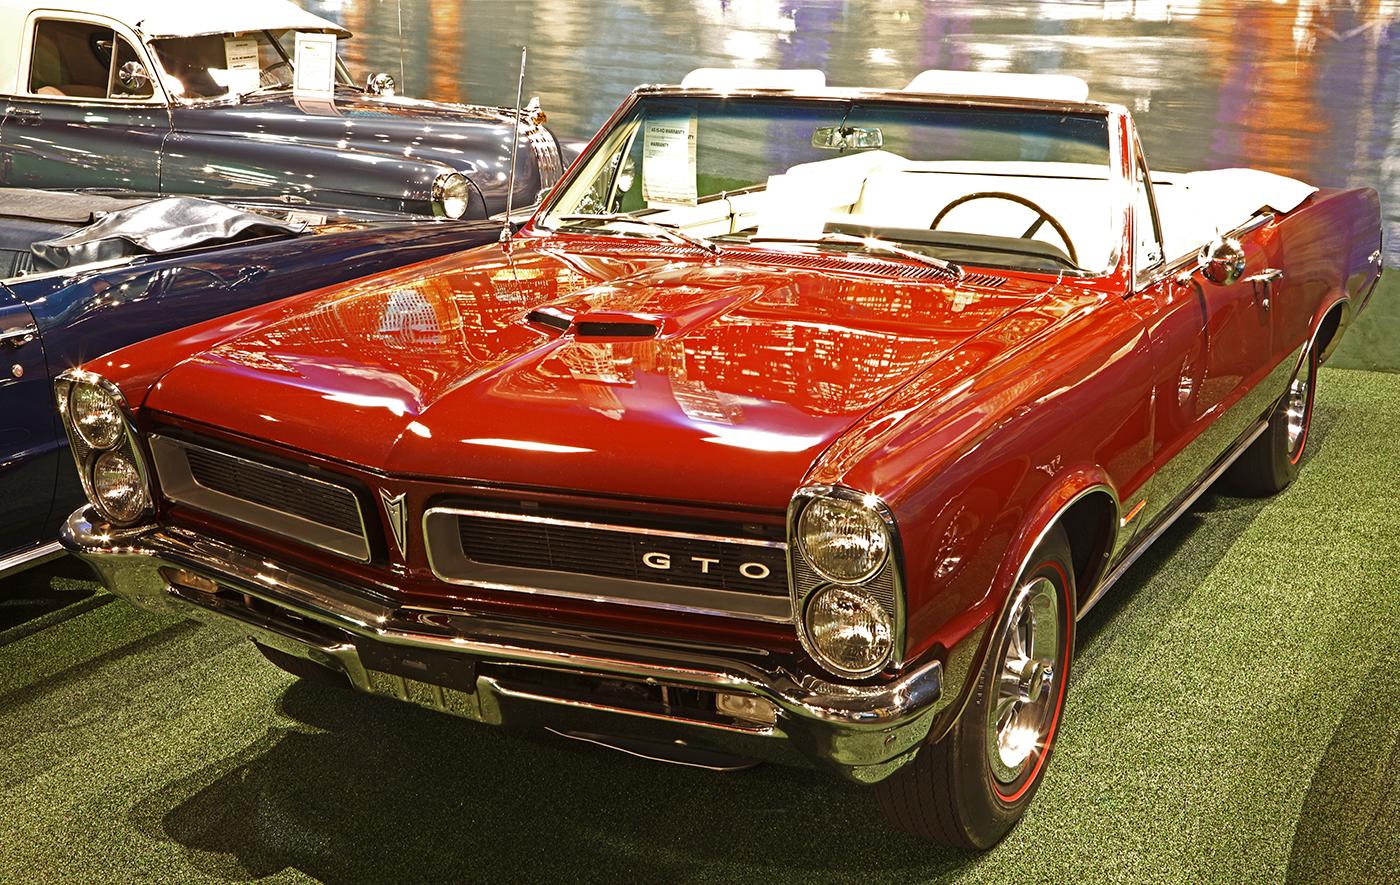 Diagram Likewise Mustang Convertible Top Wiring Diagram Moreover 1966